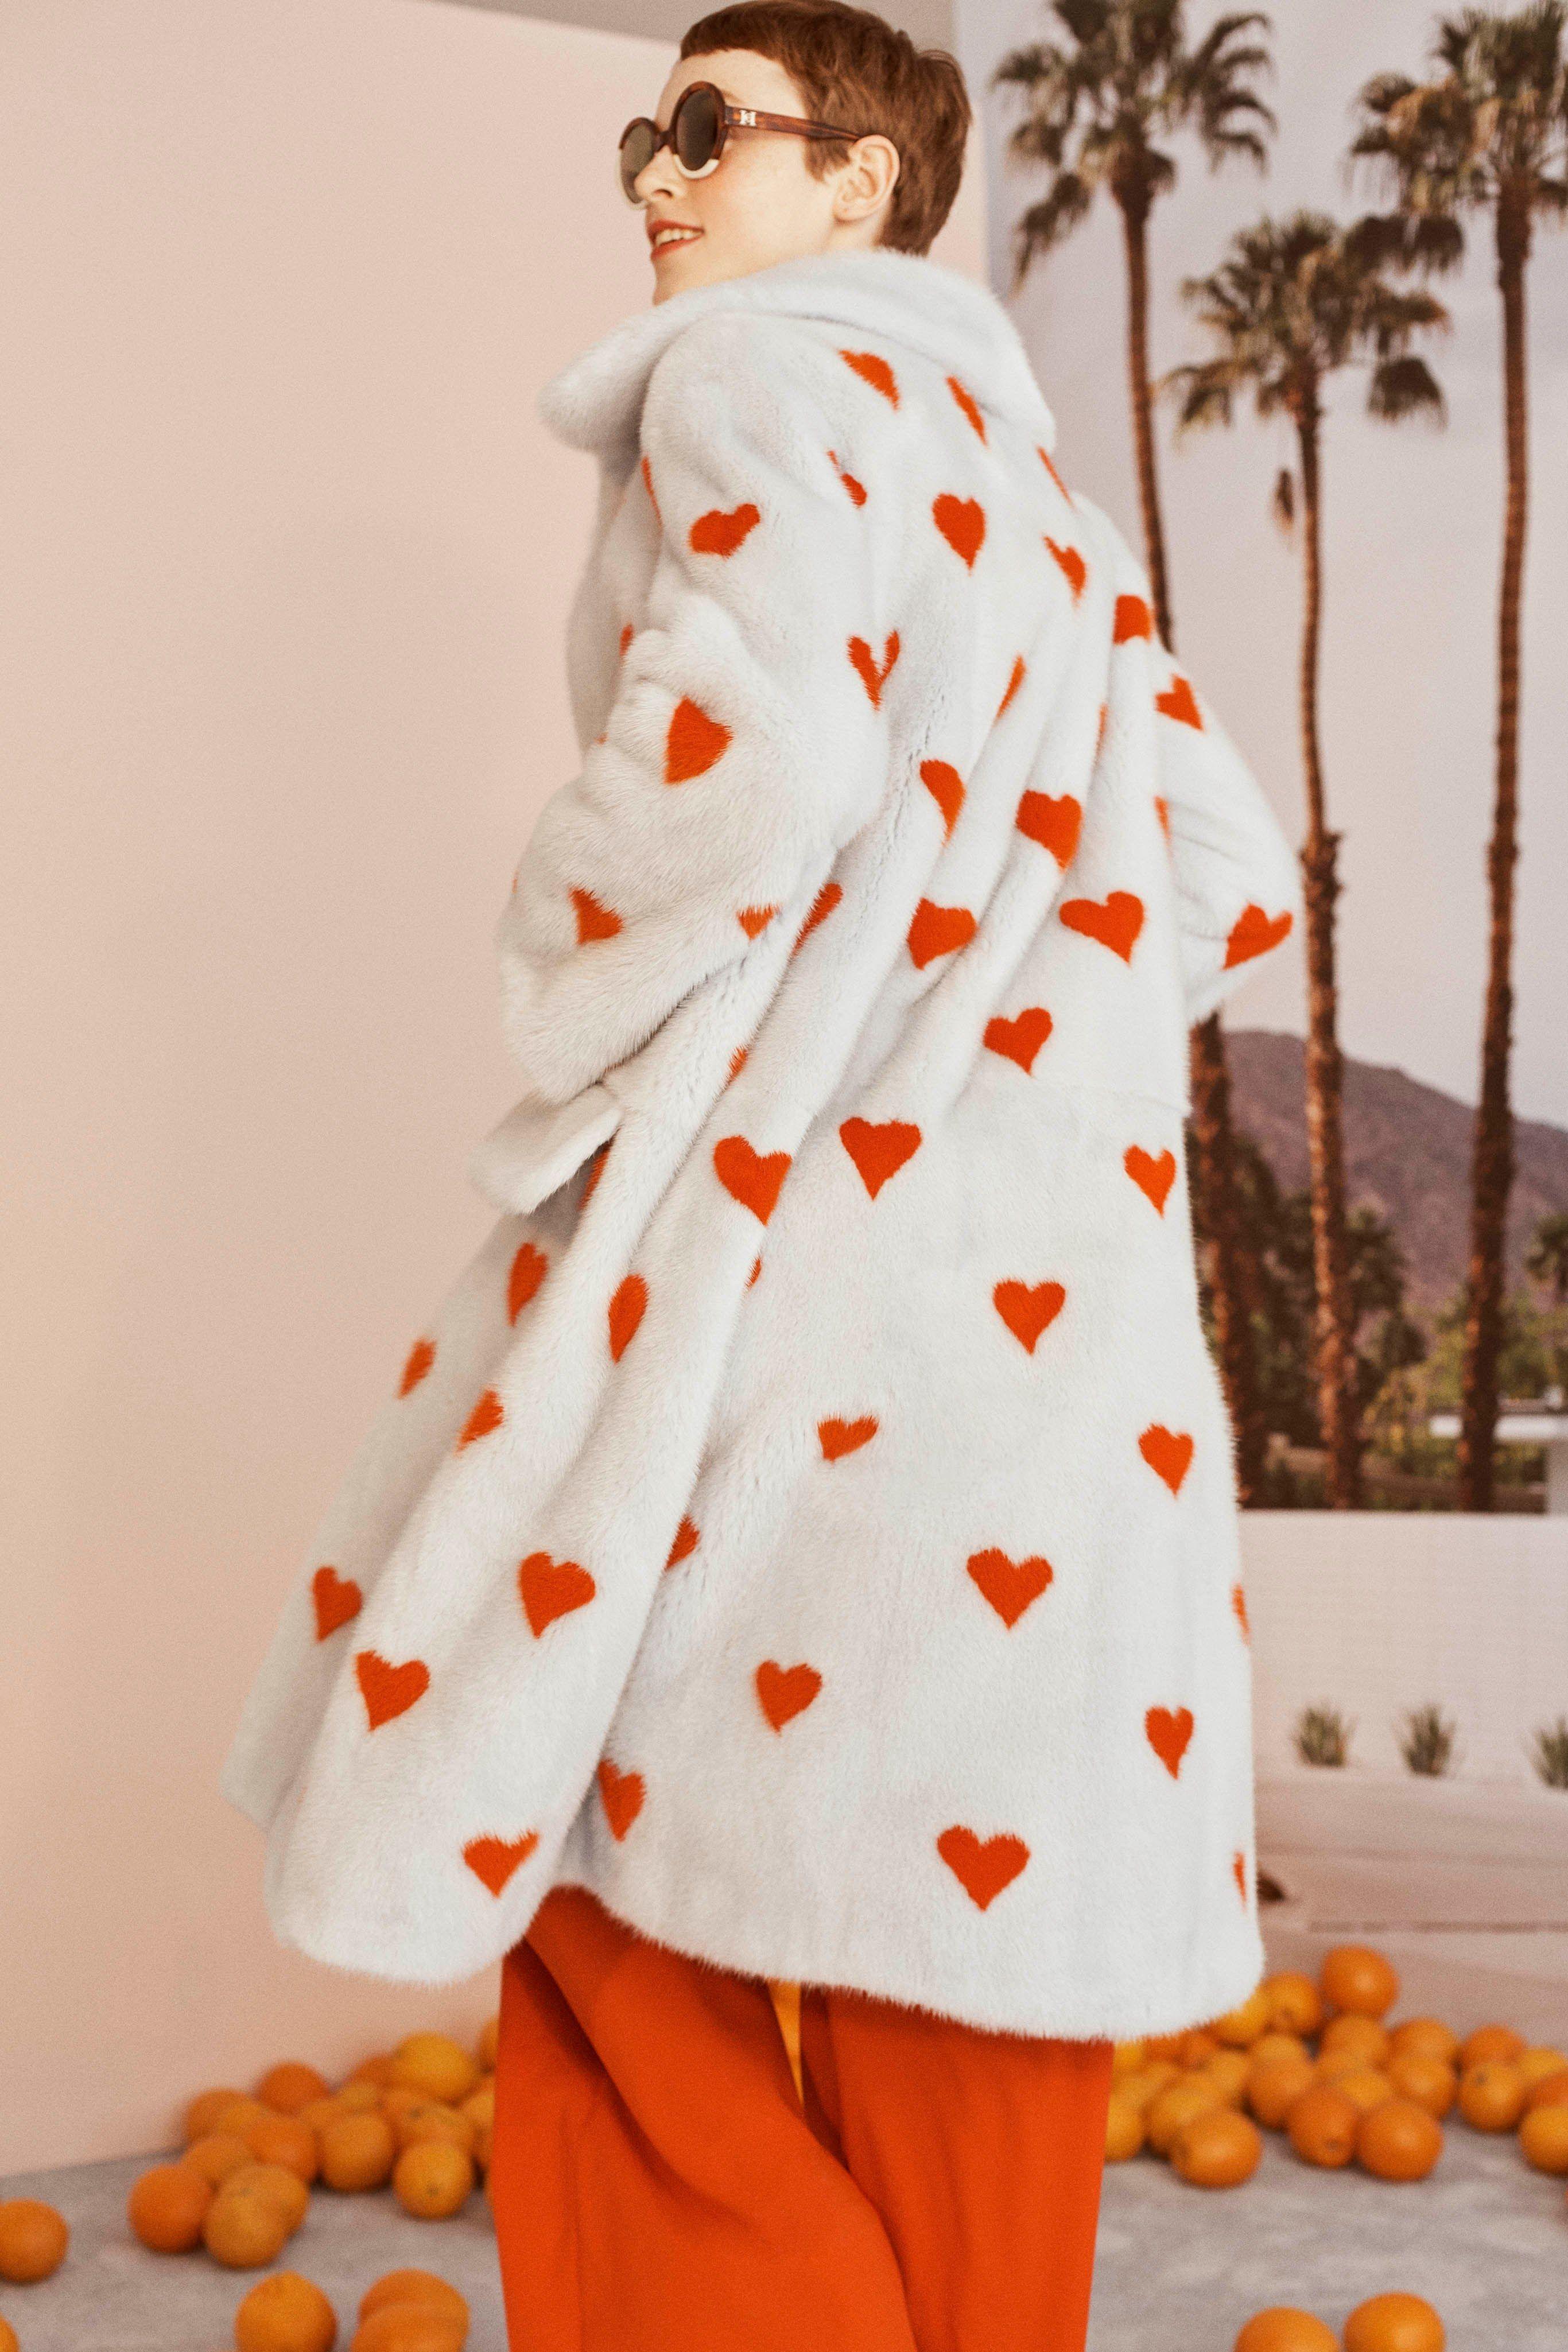 Carolina Herrera Resort 2019 Fashion Show In 2018 Valentine S Day